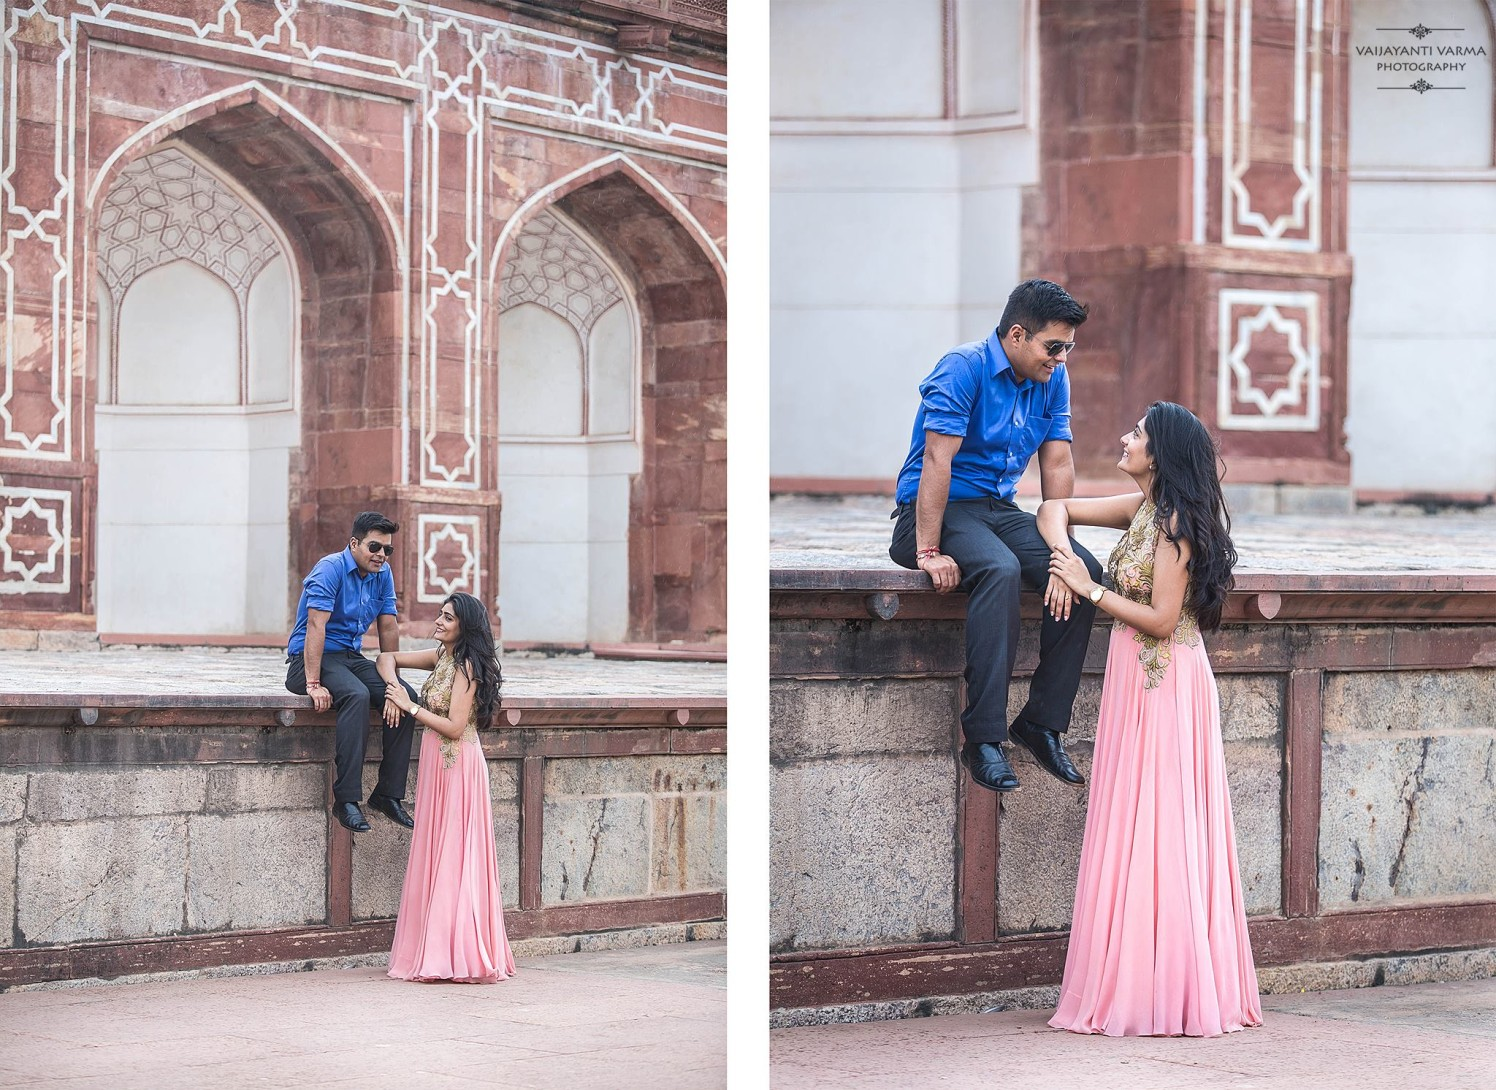 Happiness overload! by Vaijayanti Varma Photography Wedding-photography | Weddings Photos & Ideas